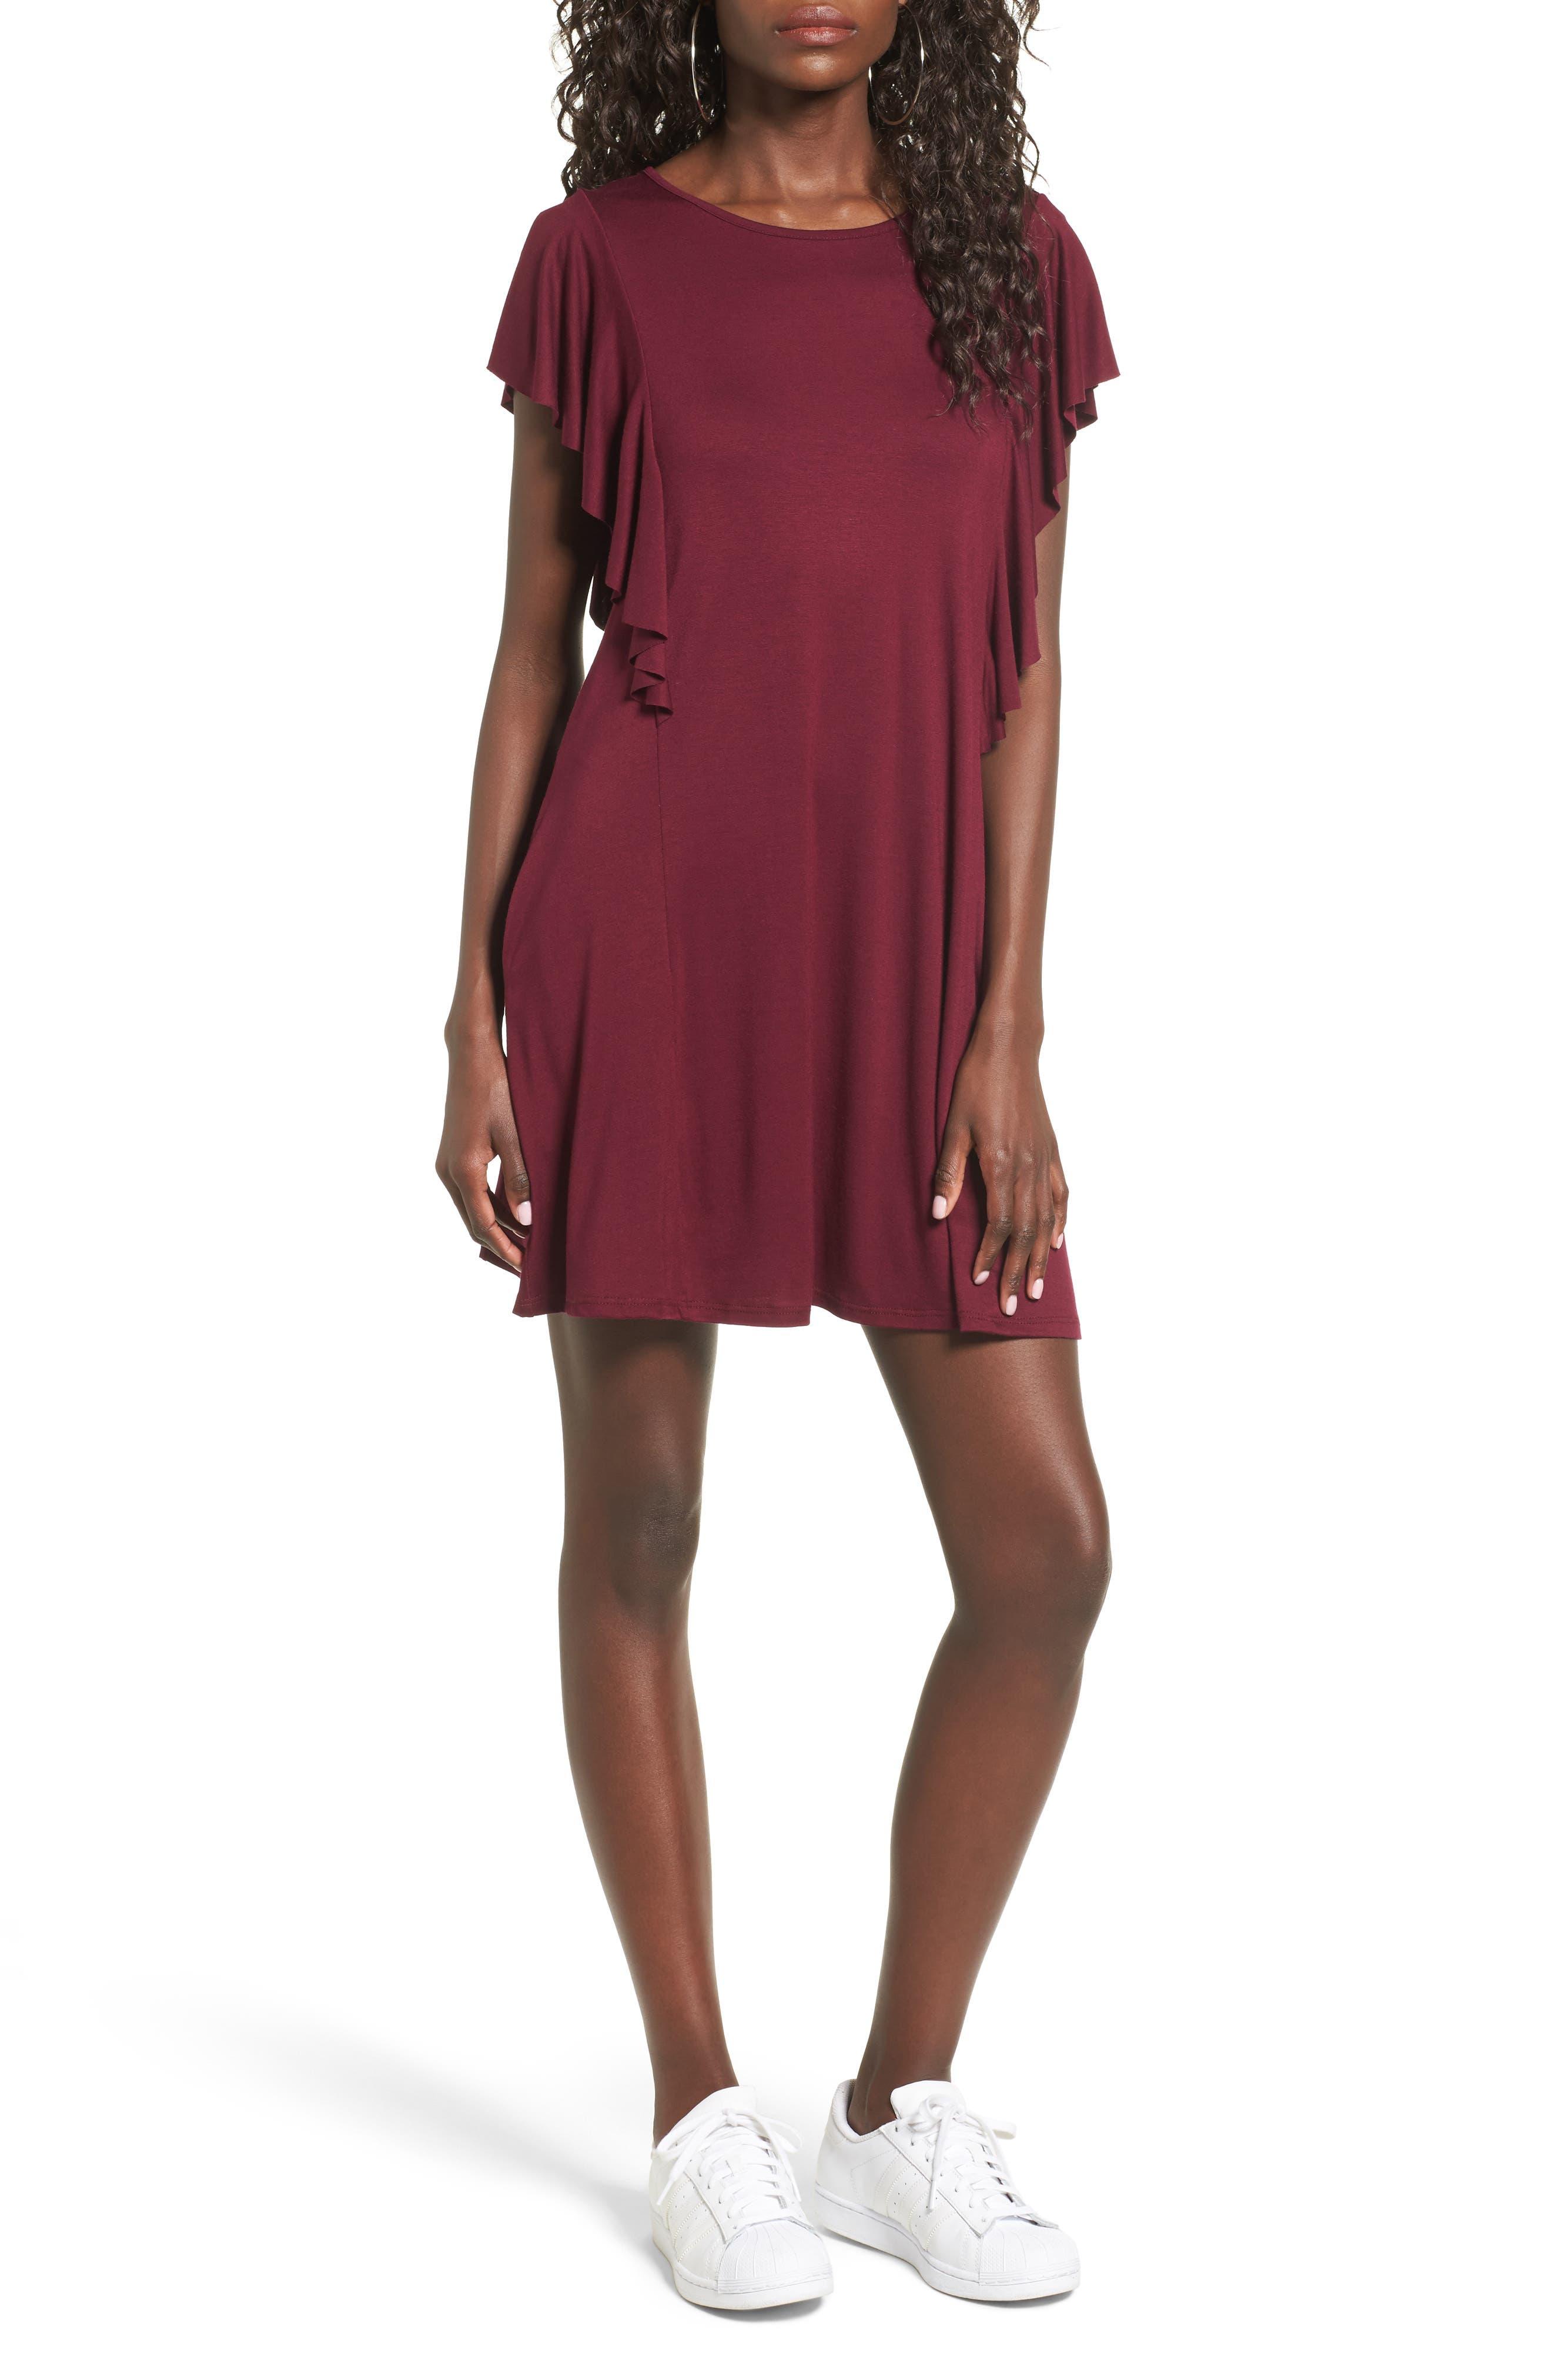 Alternate Image 1 Selected - Socialite Ruffle Sleeve T-Shirt Dress